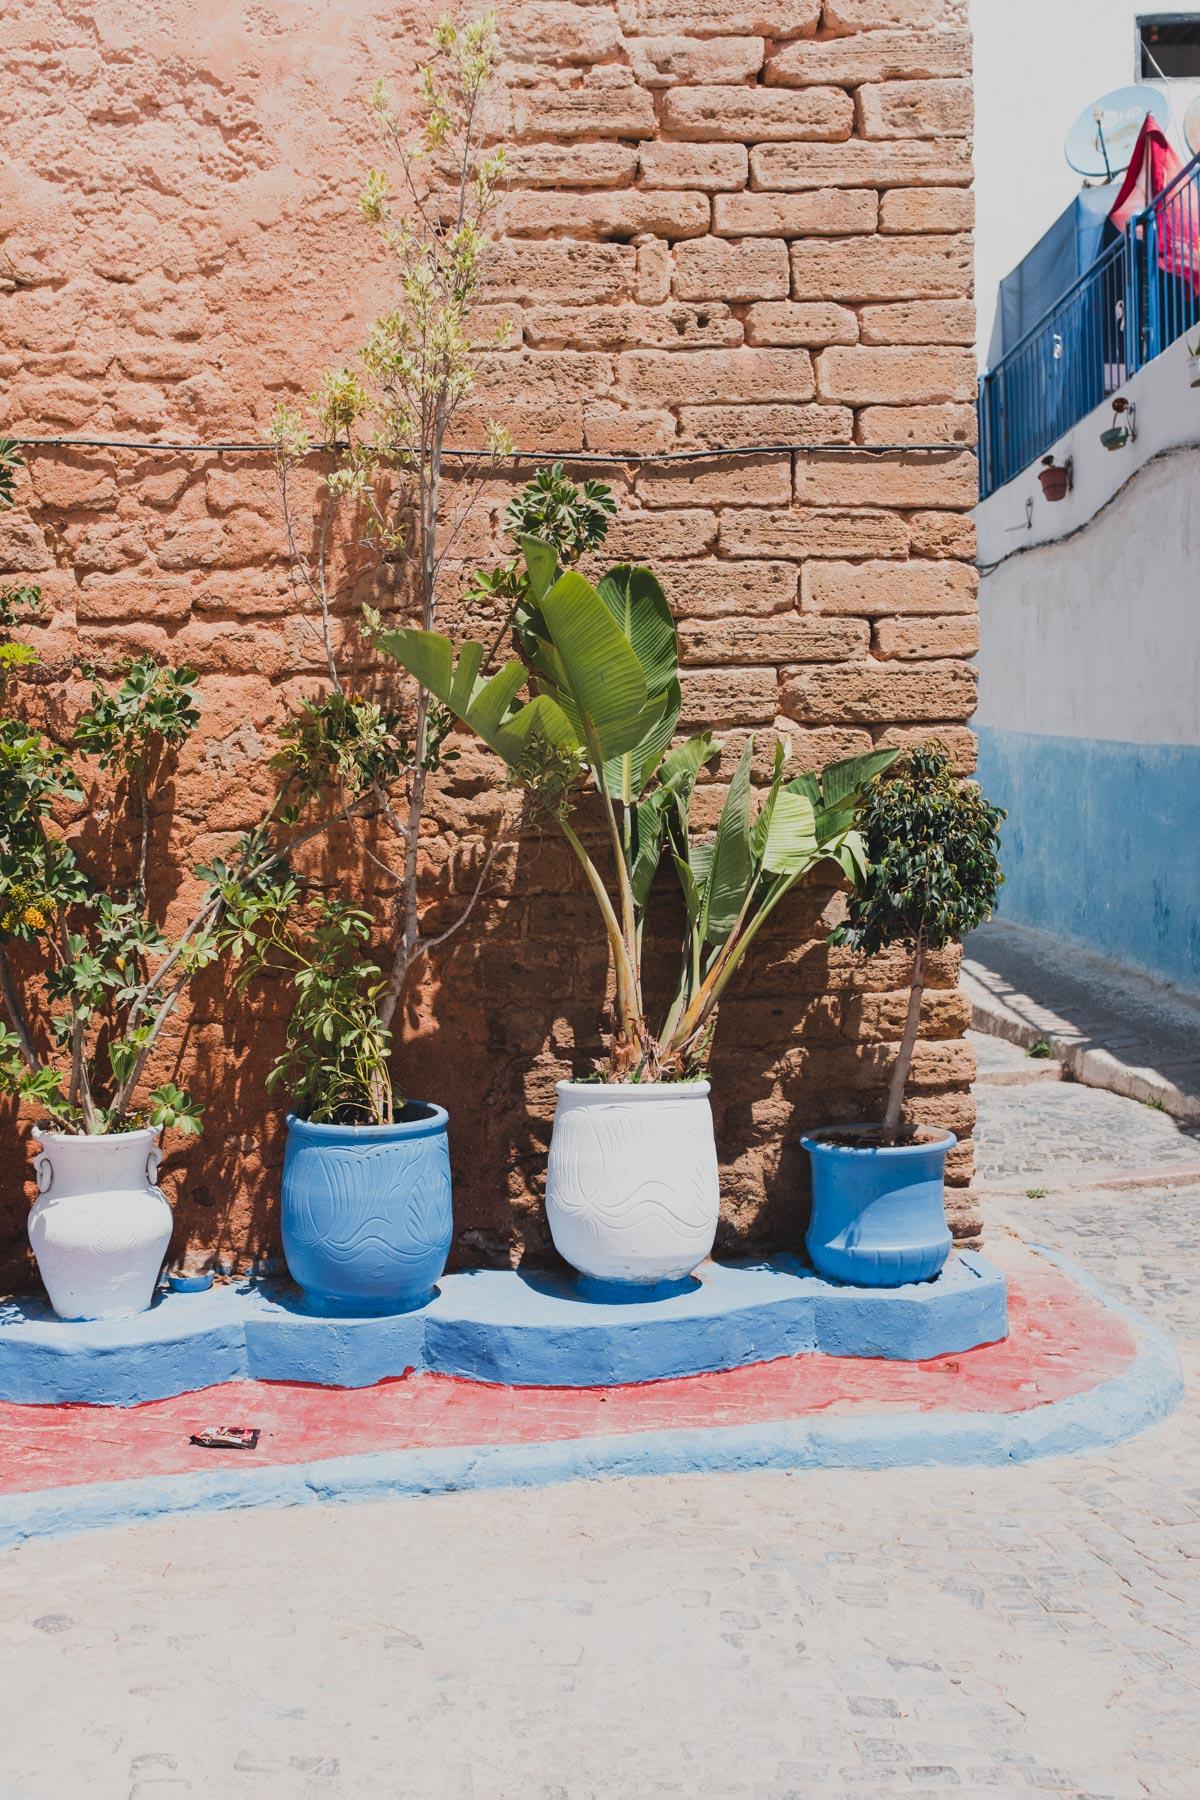 2018 Morocco-18.jpg